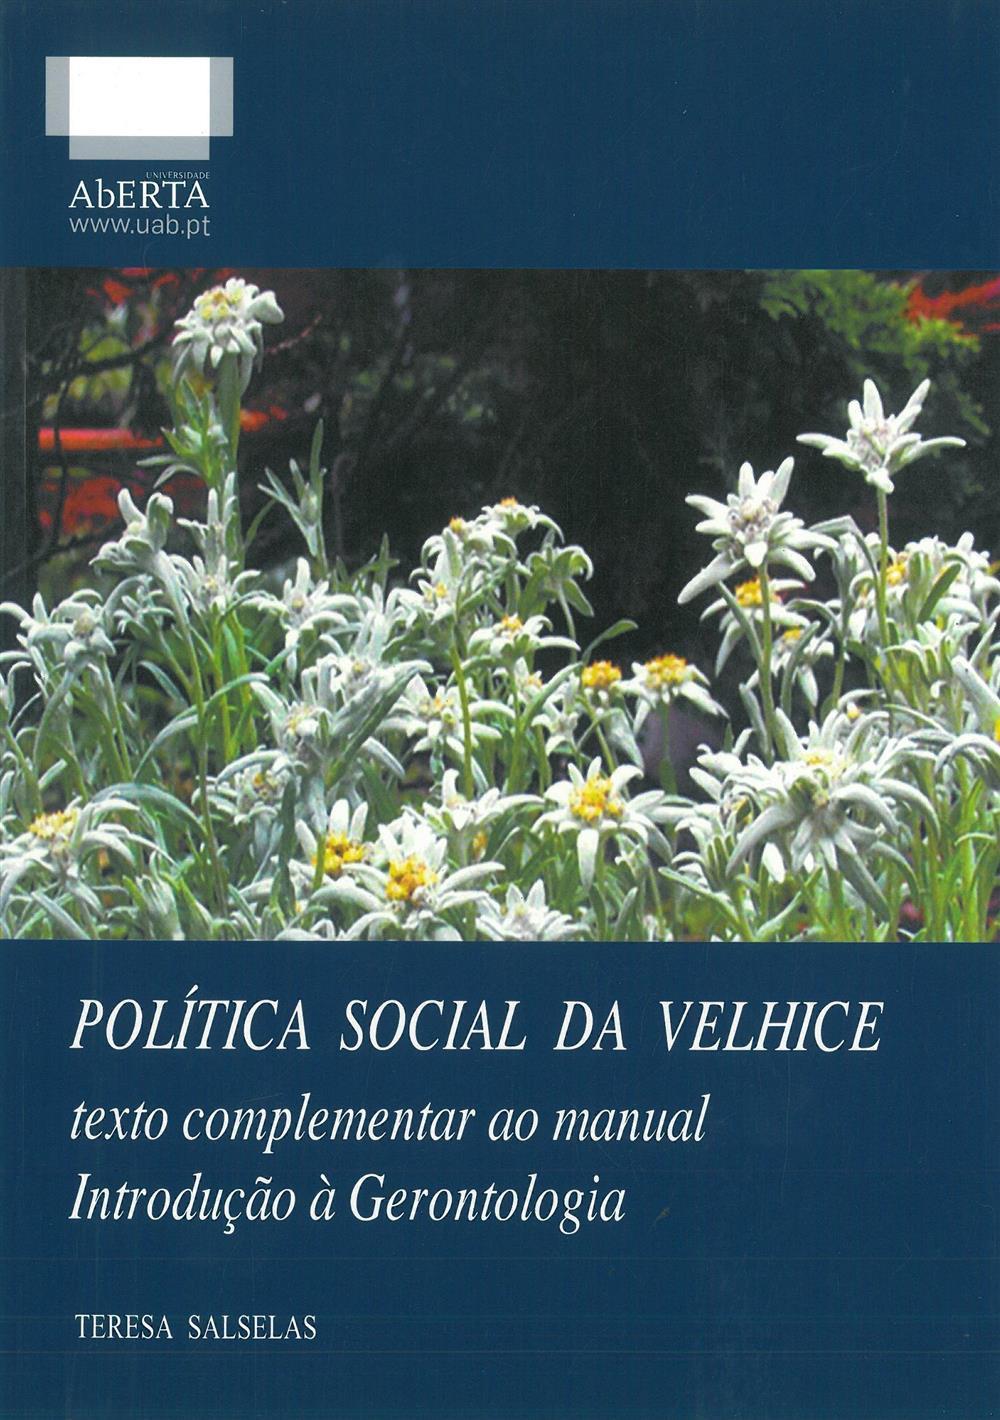 Política social da velhice_.jpg